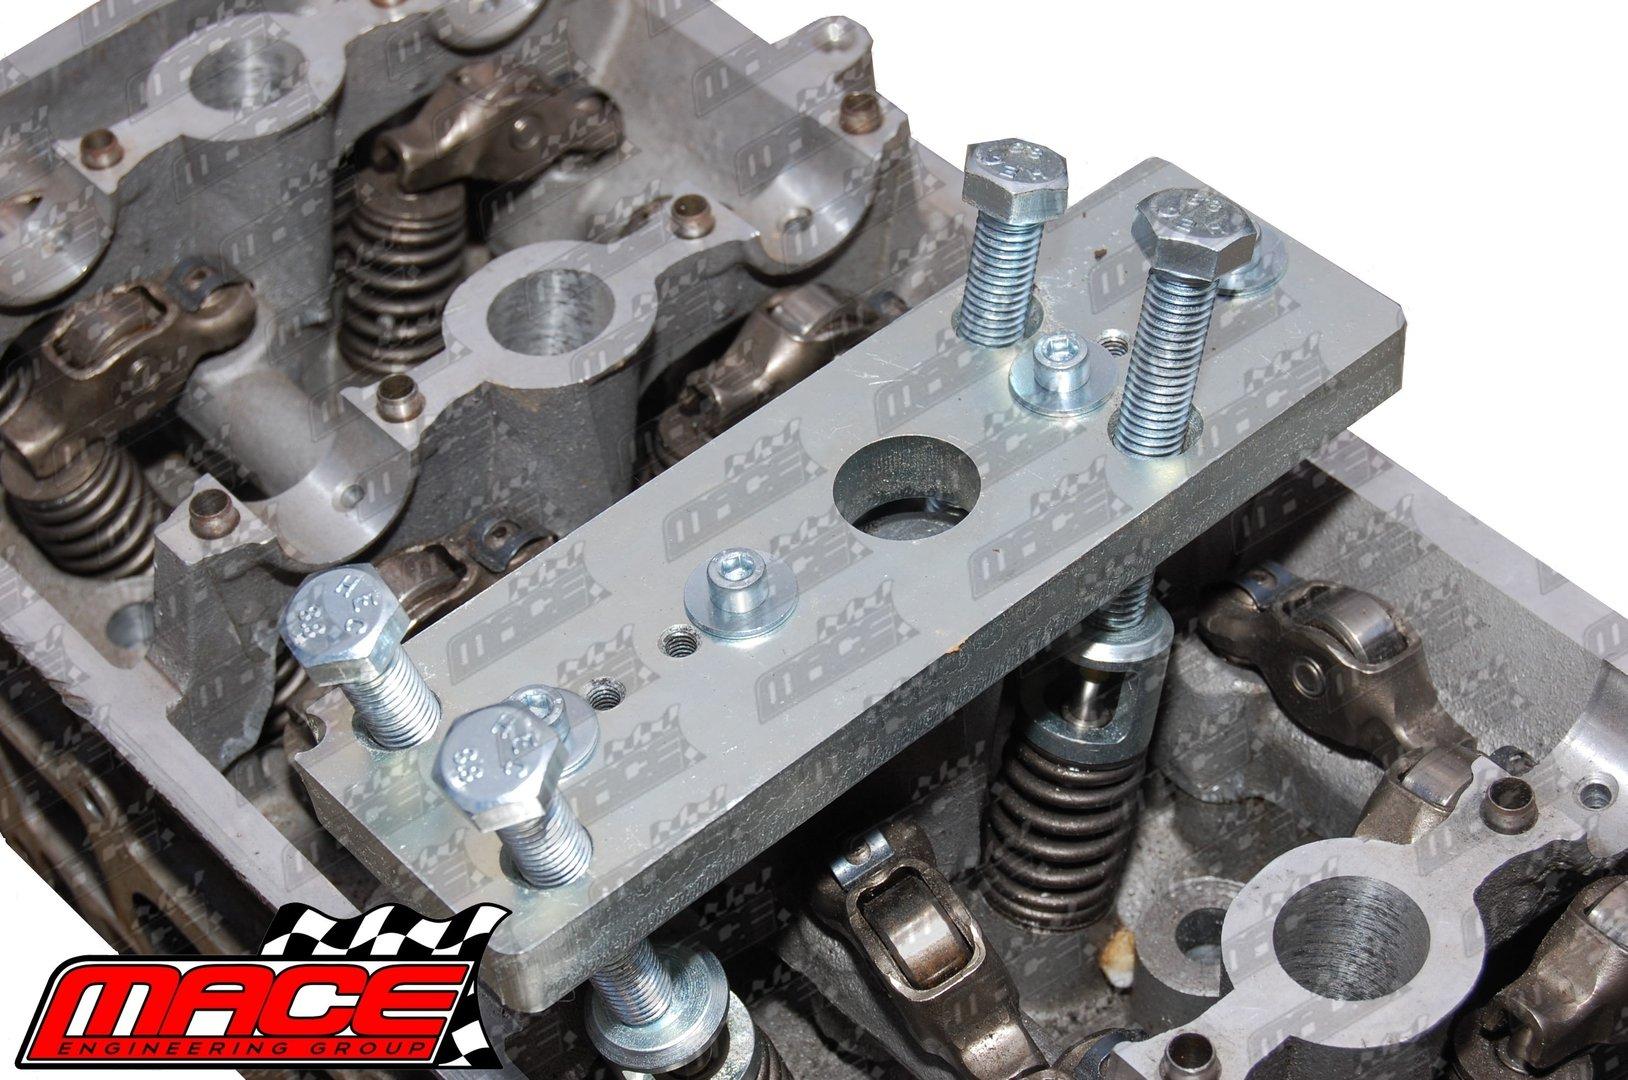 Mace Valve Spring Compressor Tool To Suit Ford Barra 182 190 195 E